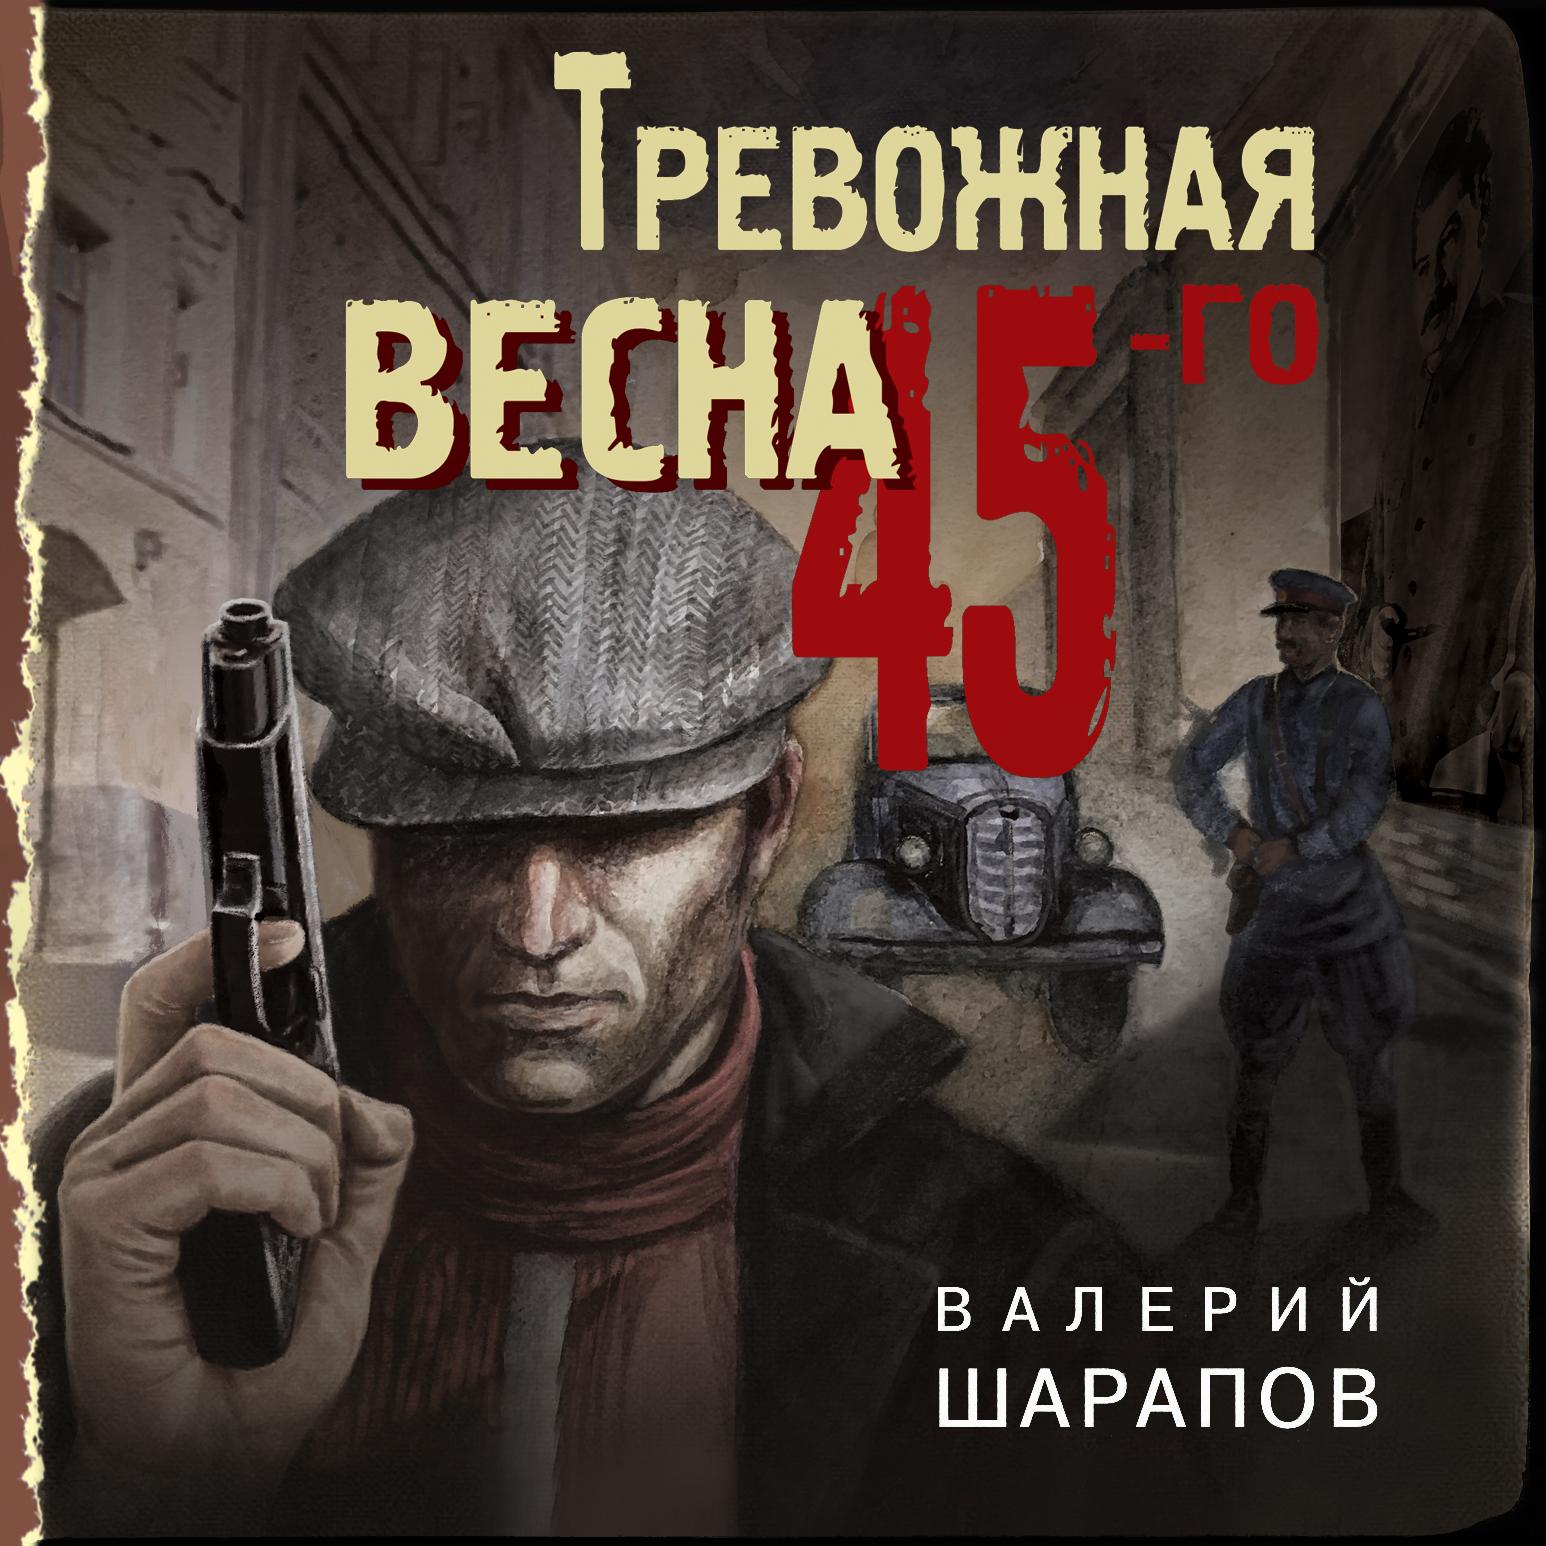 Купить книгу Тревожная весна 45-го, автора Валерия Шарапова